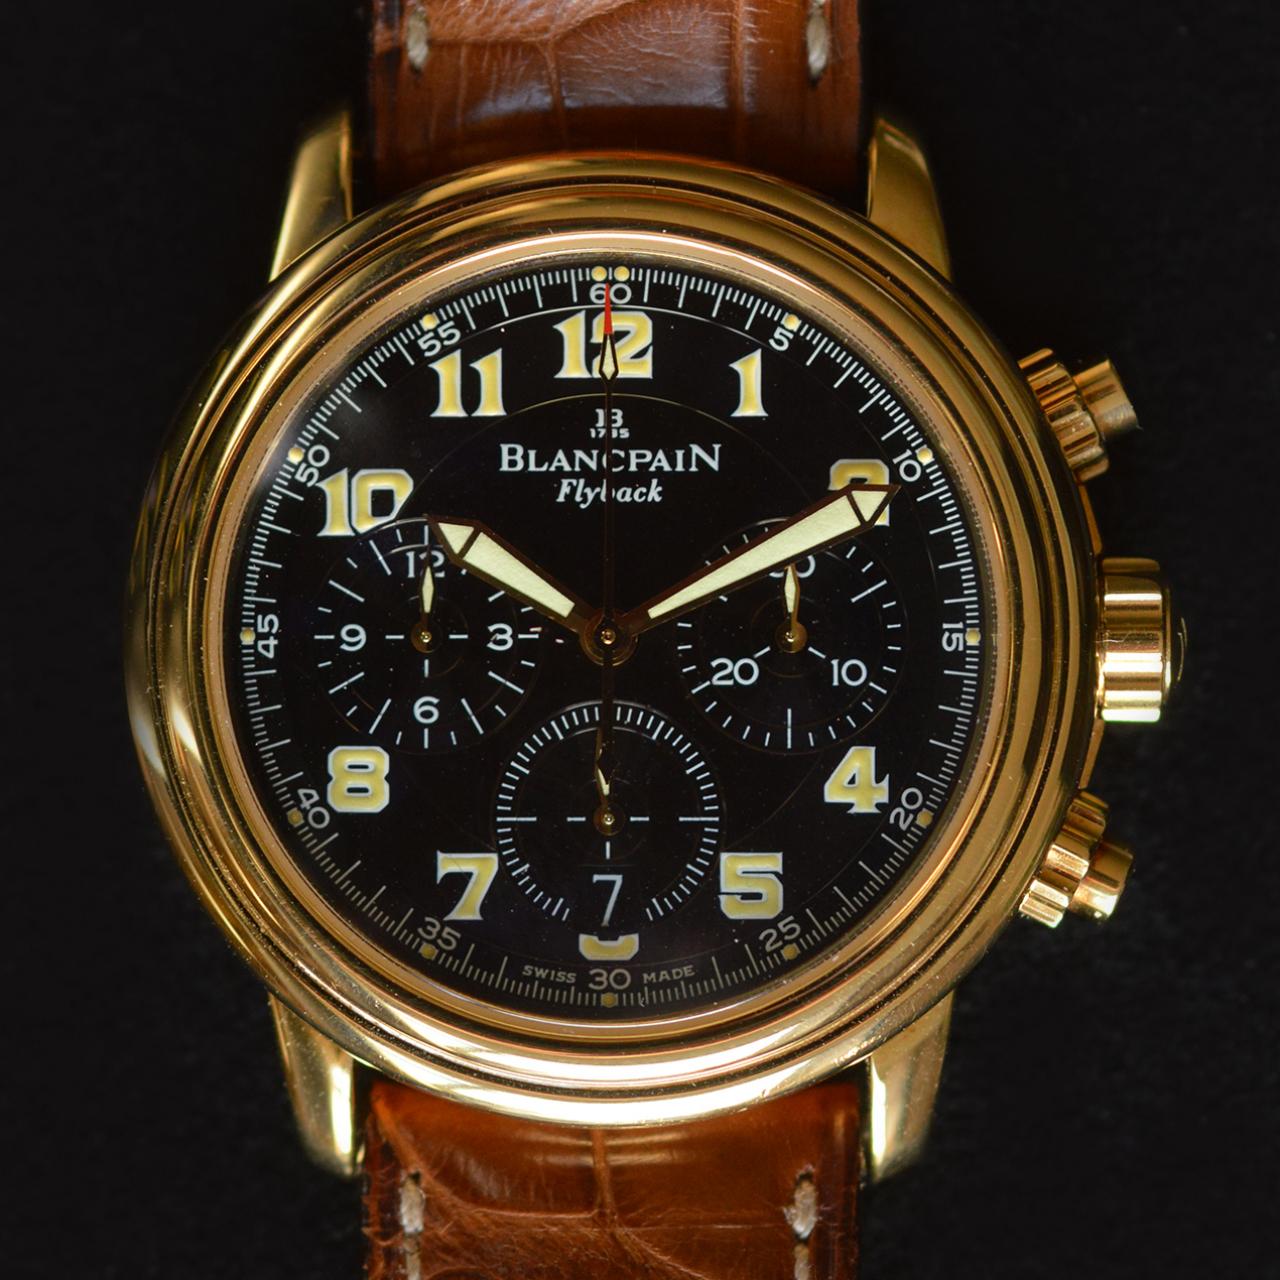 blancpain-flyback-chronograph-leman-ref-2185f-cal-1185-gold-18k